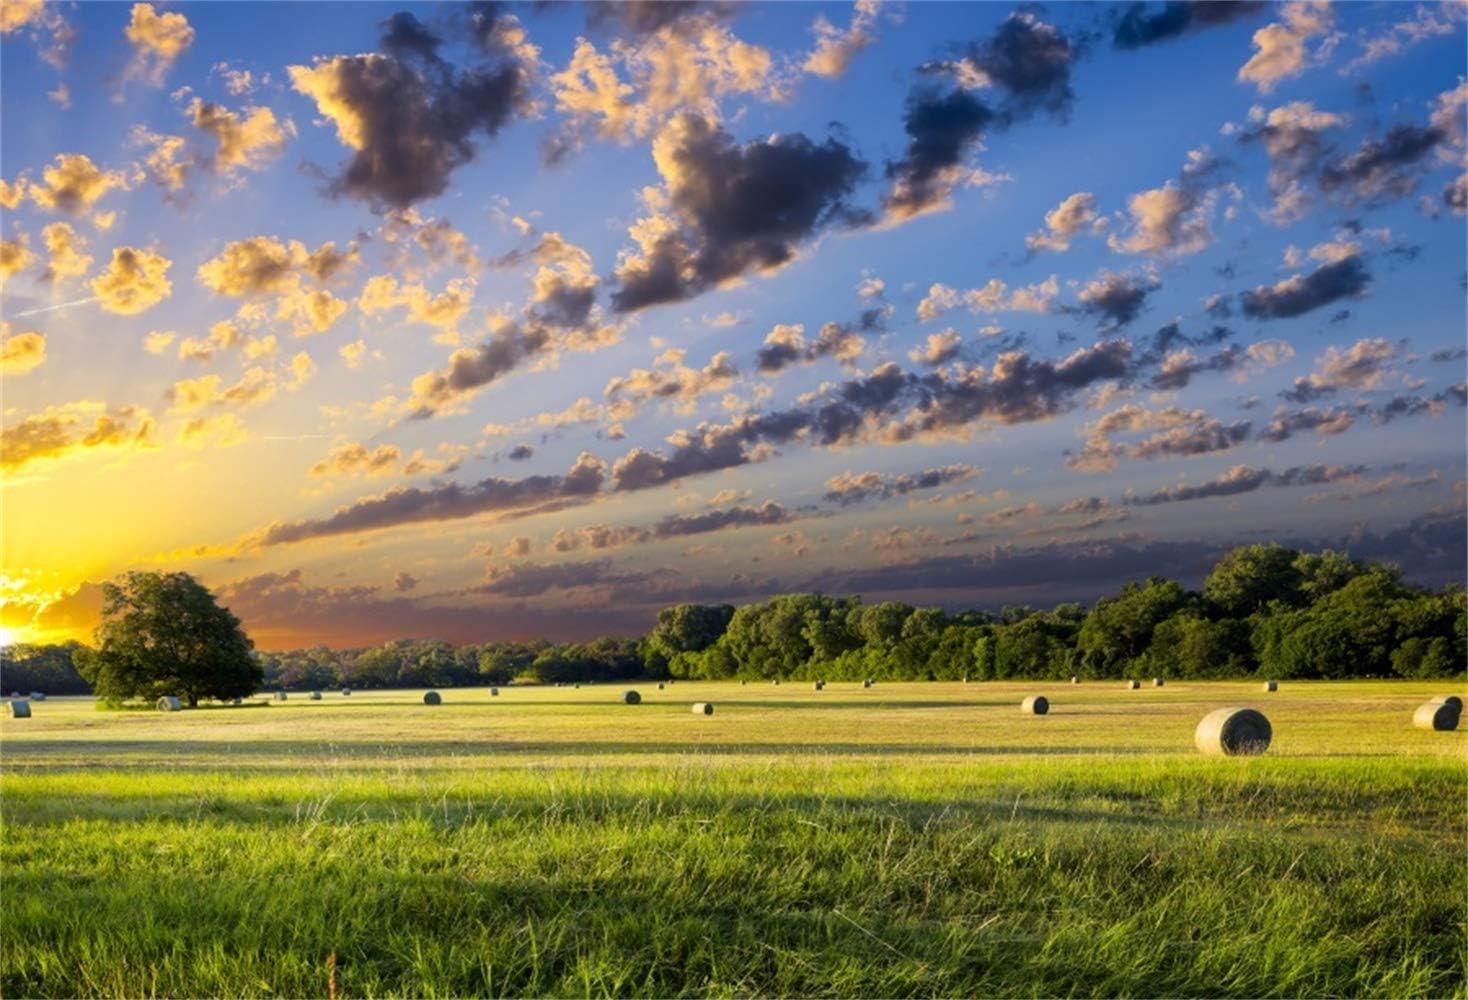 GoEoo 10x7ft Dusk Harvesting Farmland Hayricks Vinyl Photography Background Golden Sunset Glow Summer Countryside Scenery Backdrop Rural Scenic Landscape Wallpaper Studio Photo Props